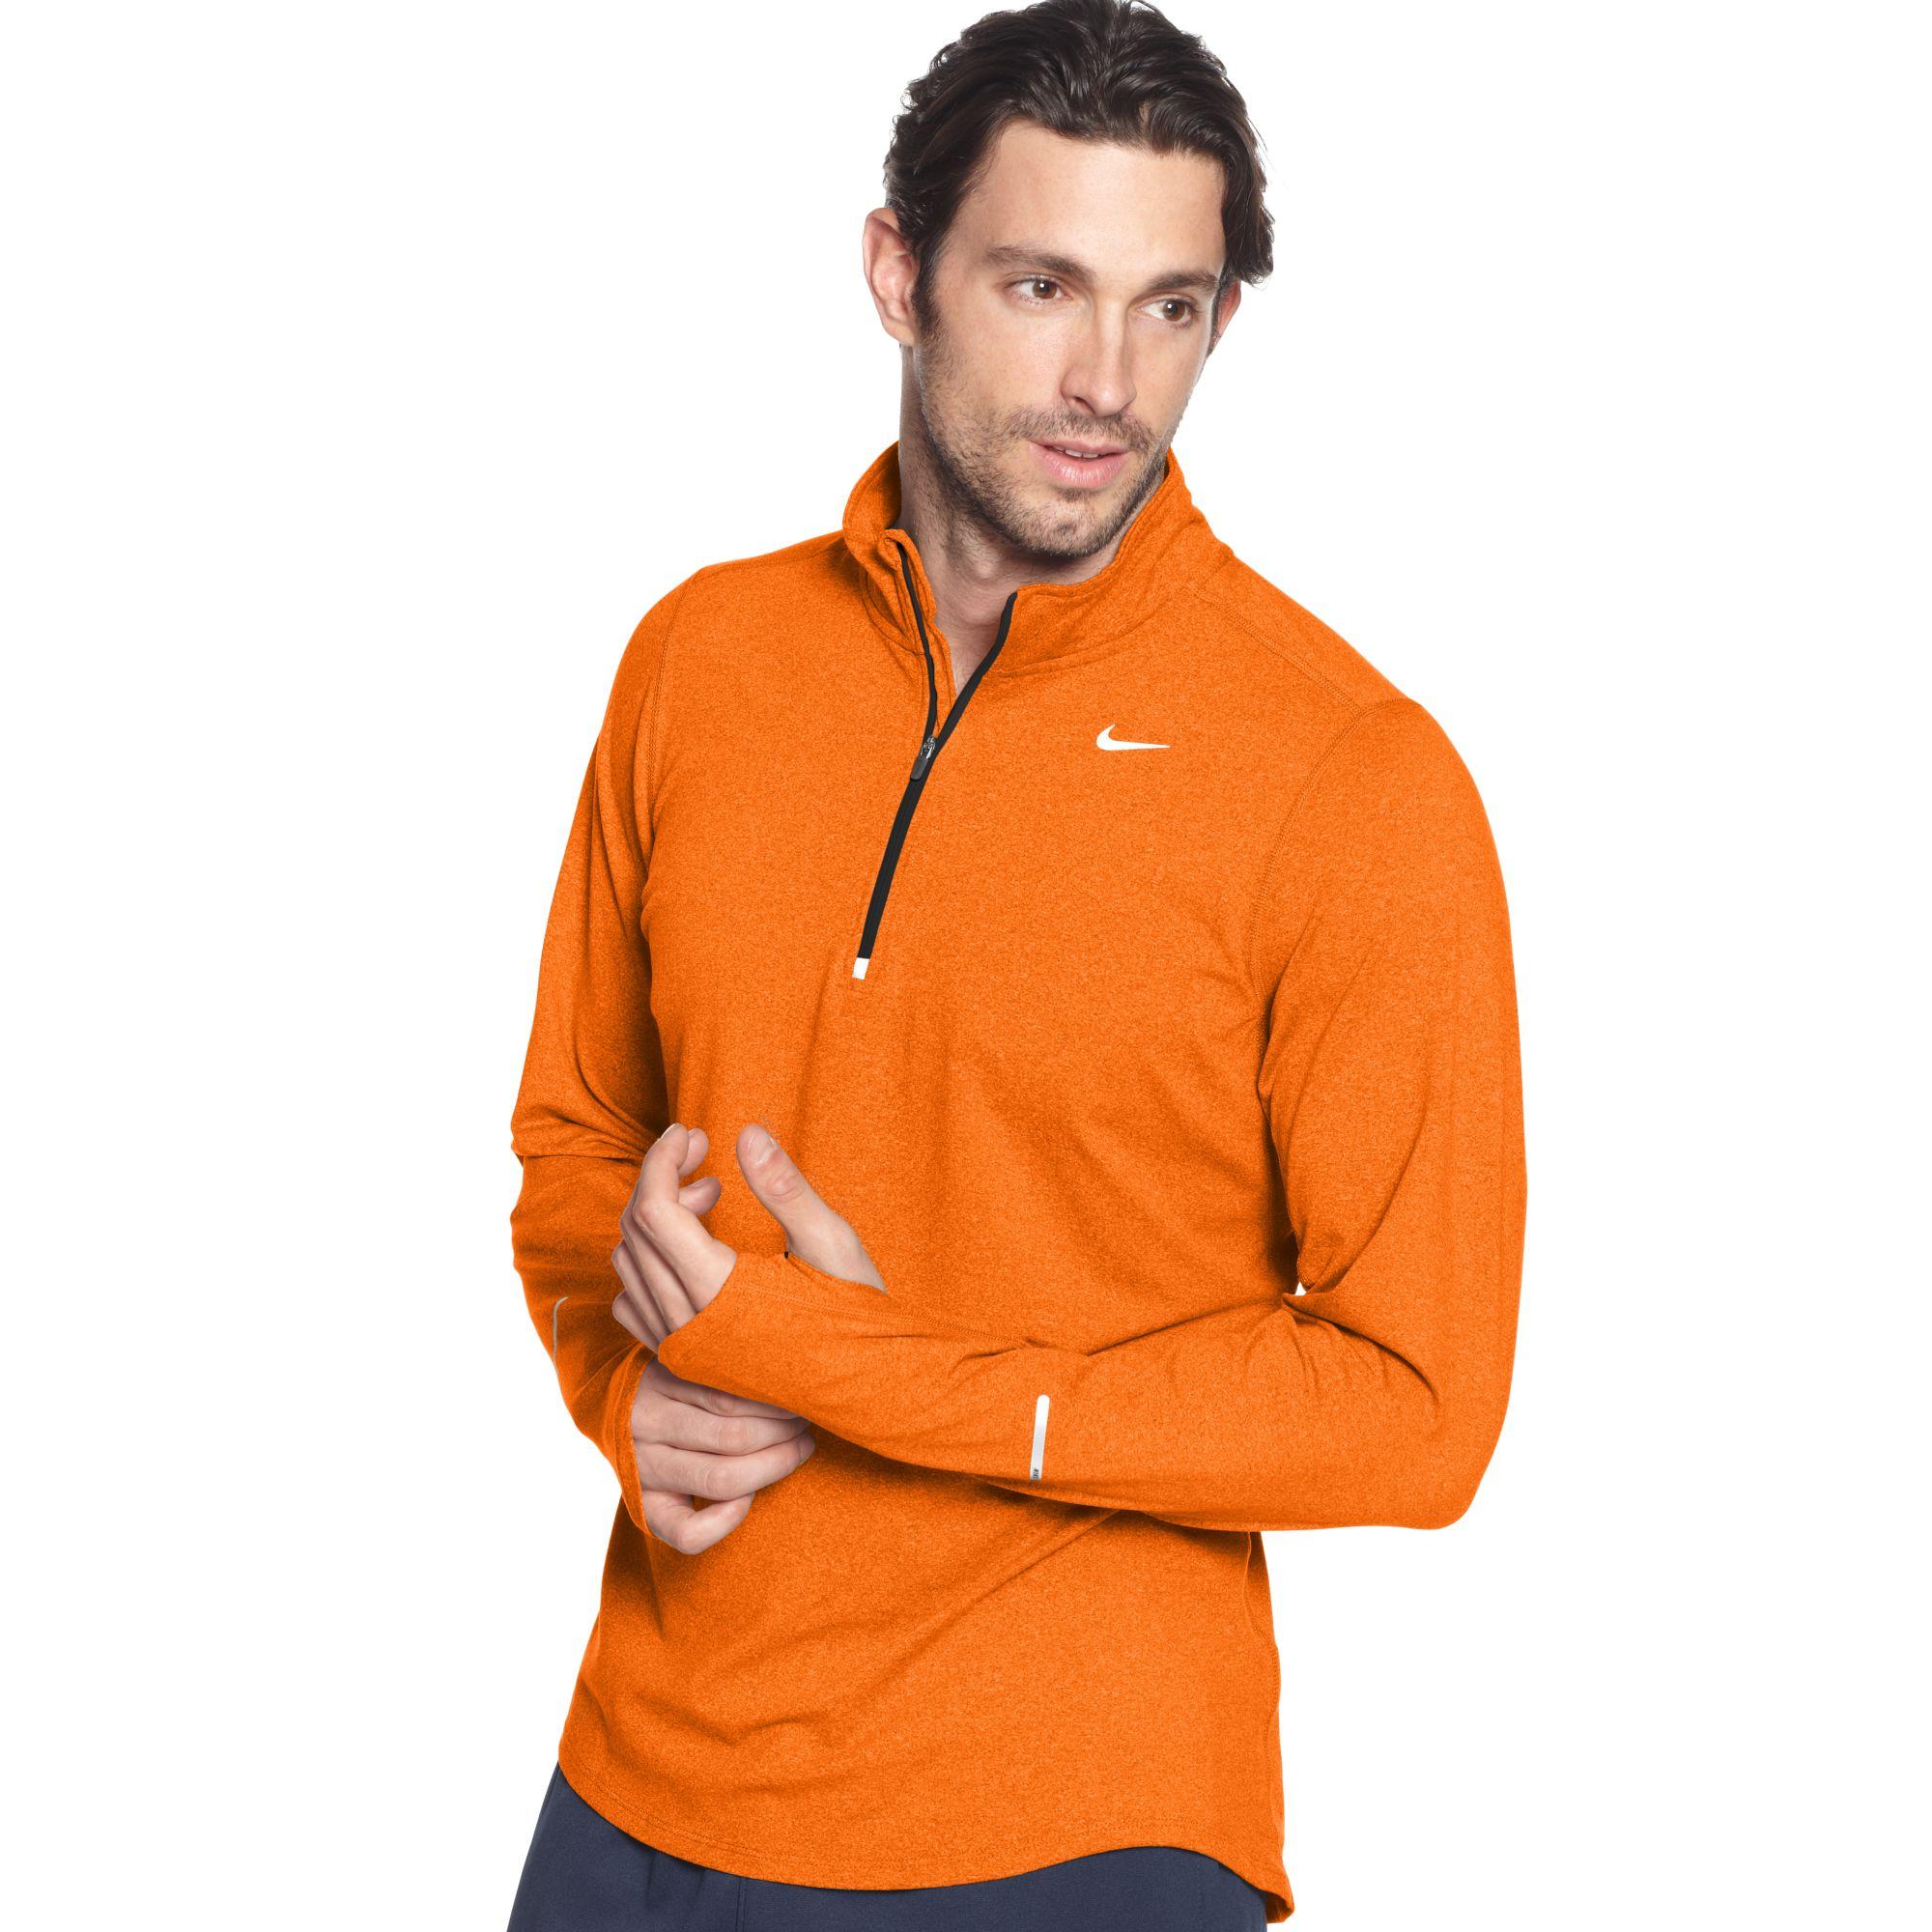 e8b45ce1d Nike Pullover Element Half Zip Shirt in Orange for Men - Lyst